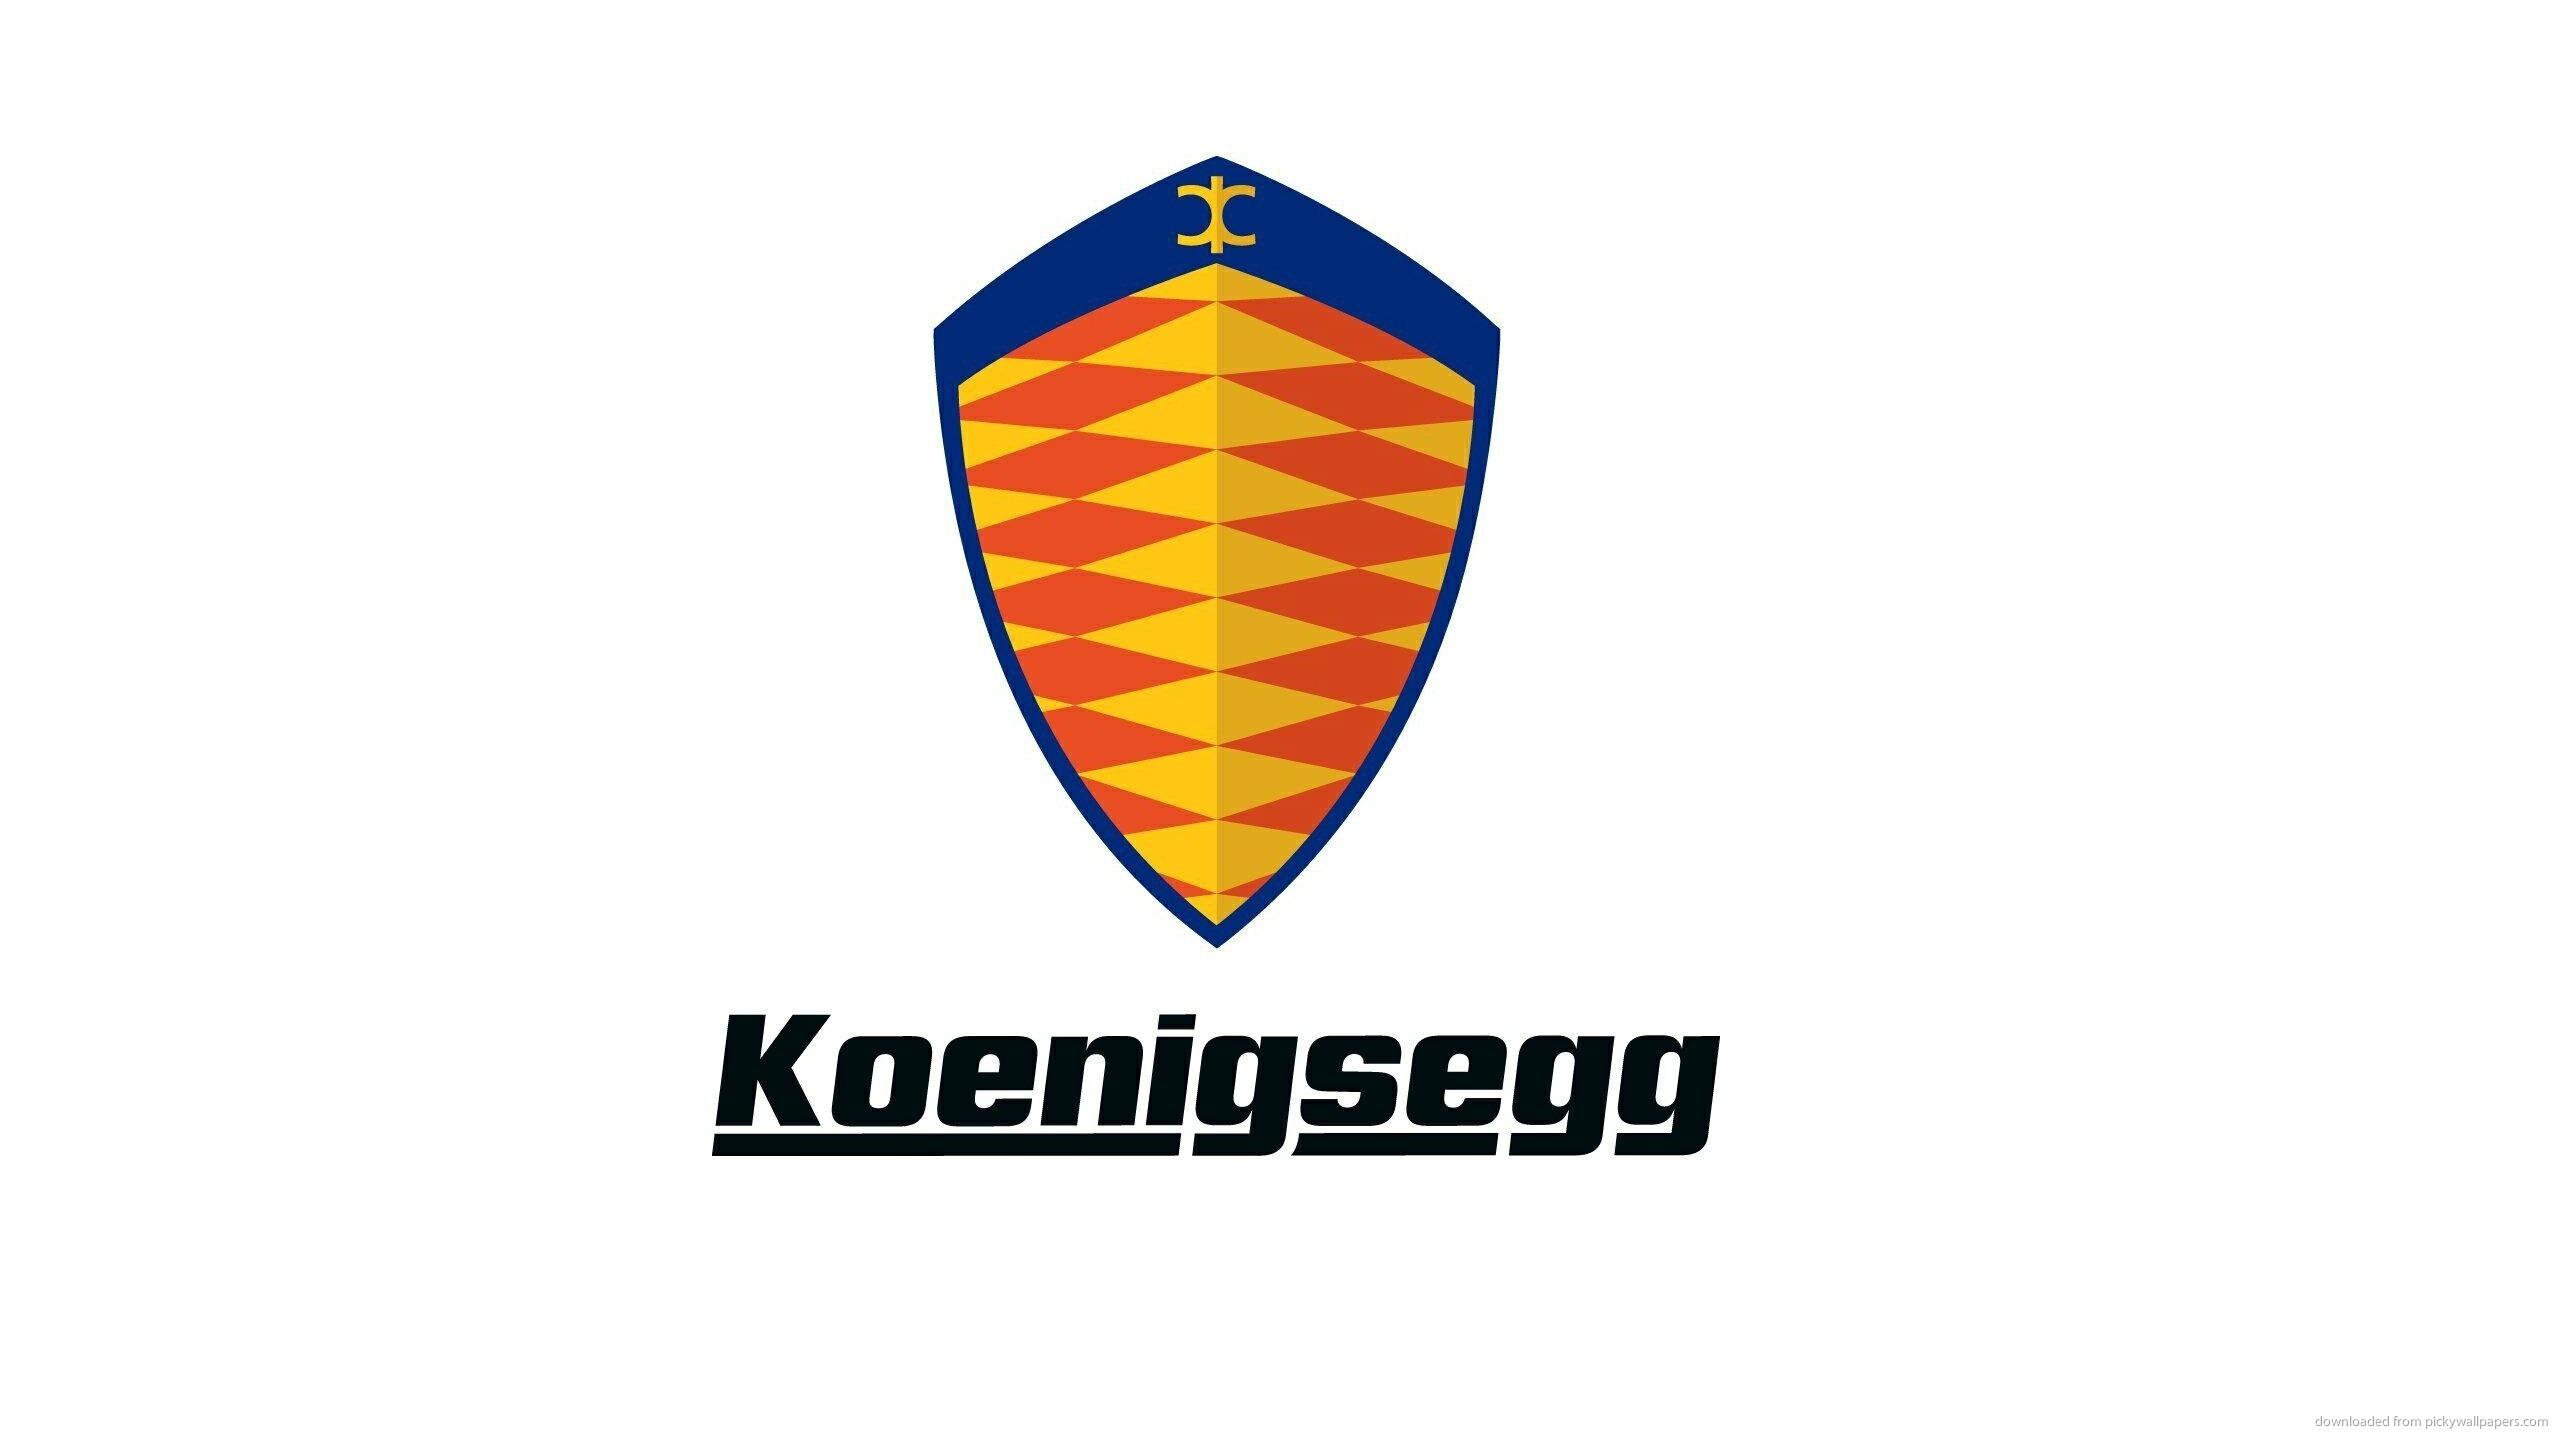 Koenigsegg logo wallpapers HD